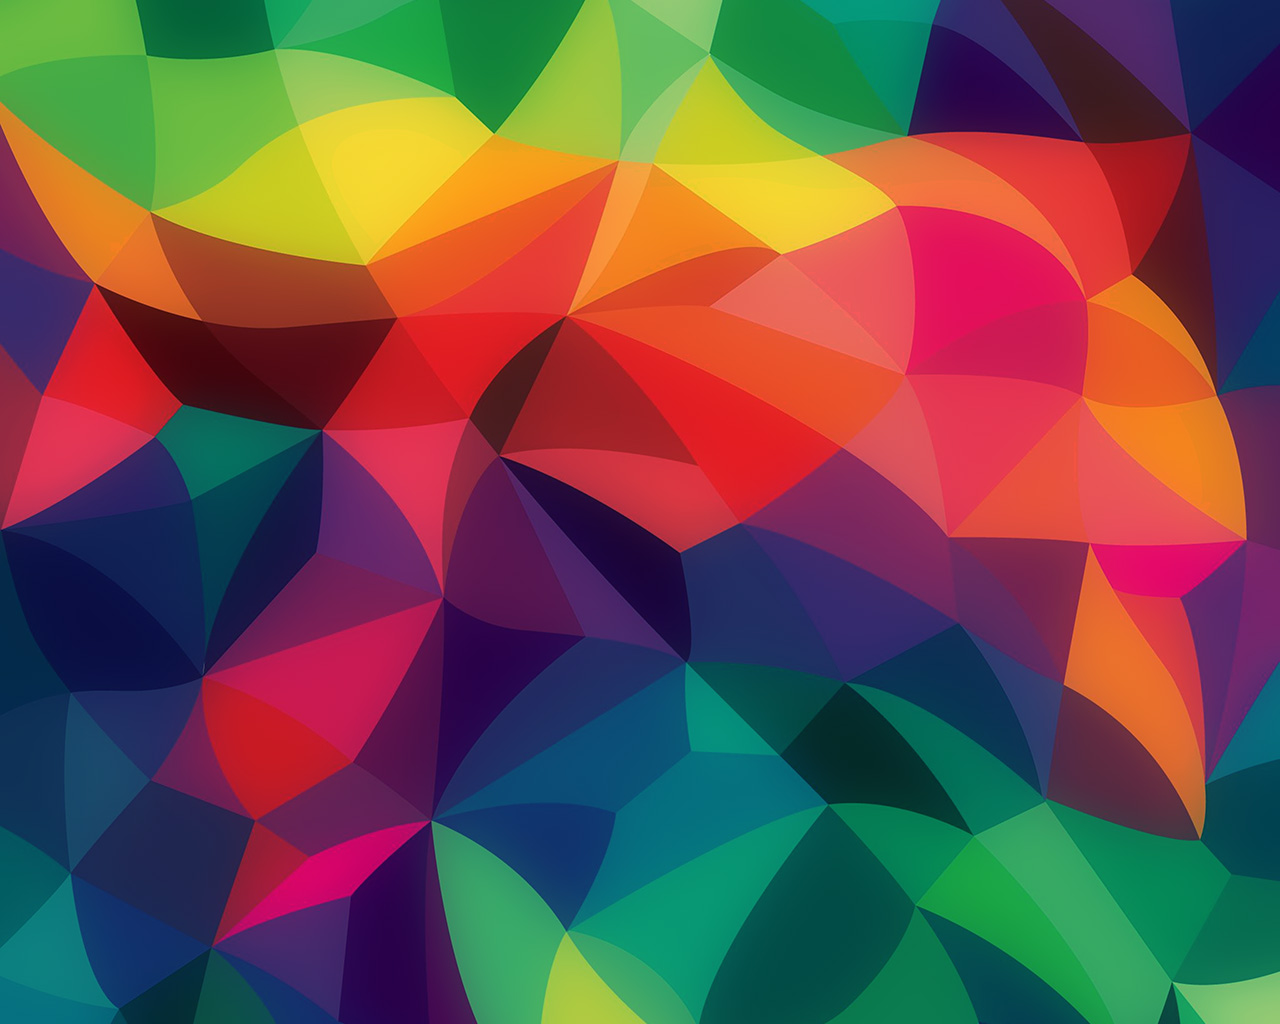 vk42-rainbow-abstract-colors-pastel-dark-pattern-wallpaper